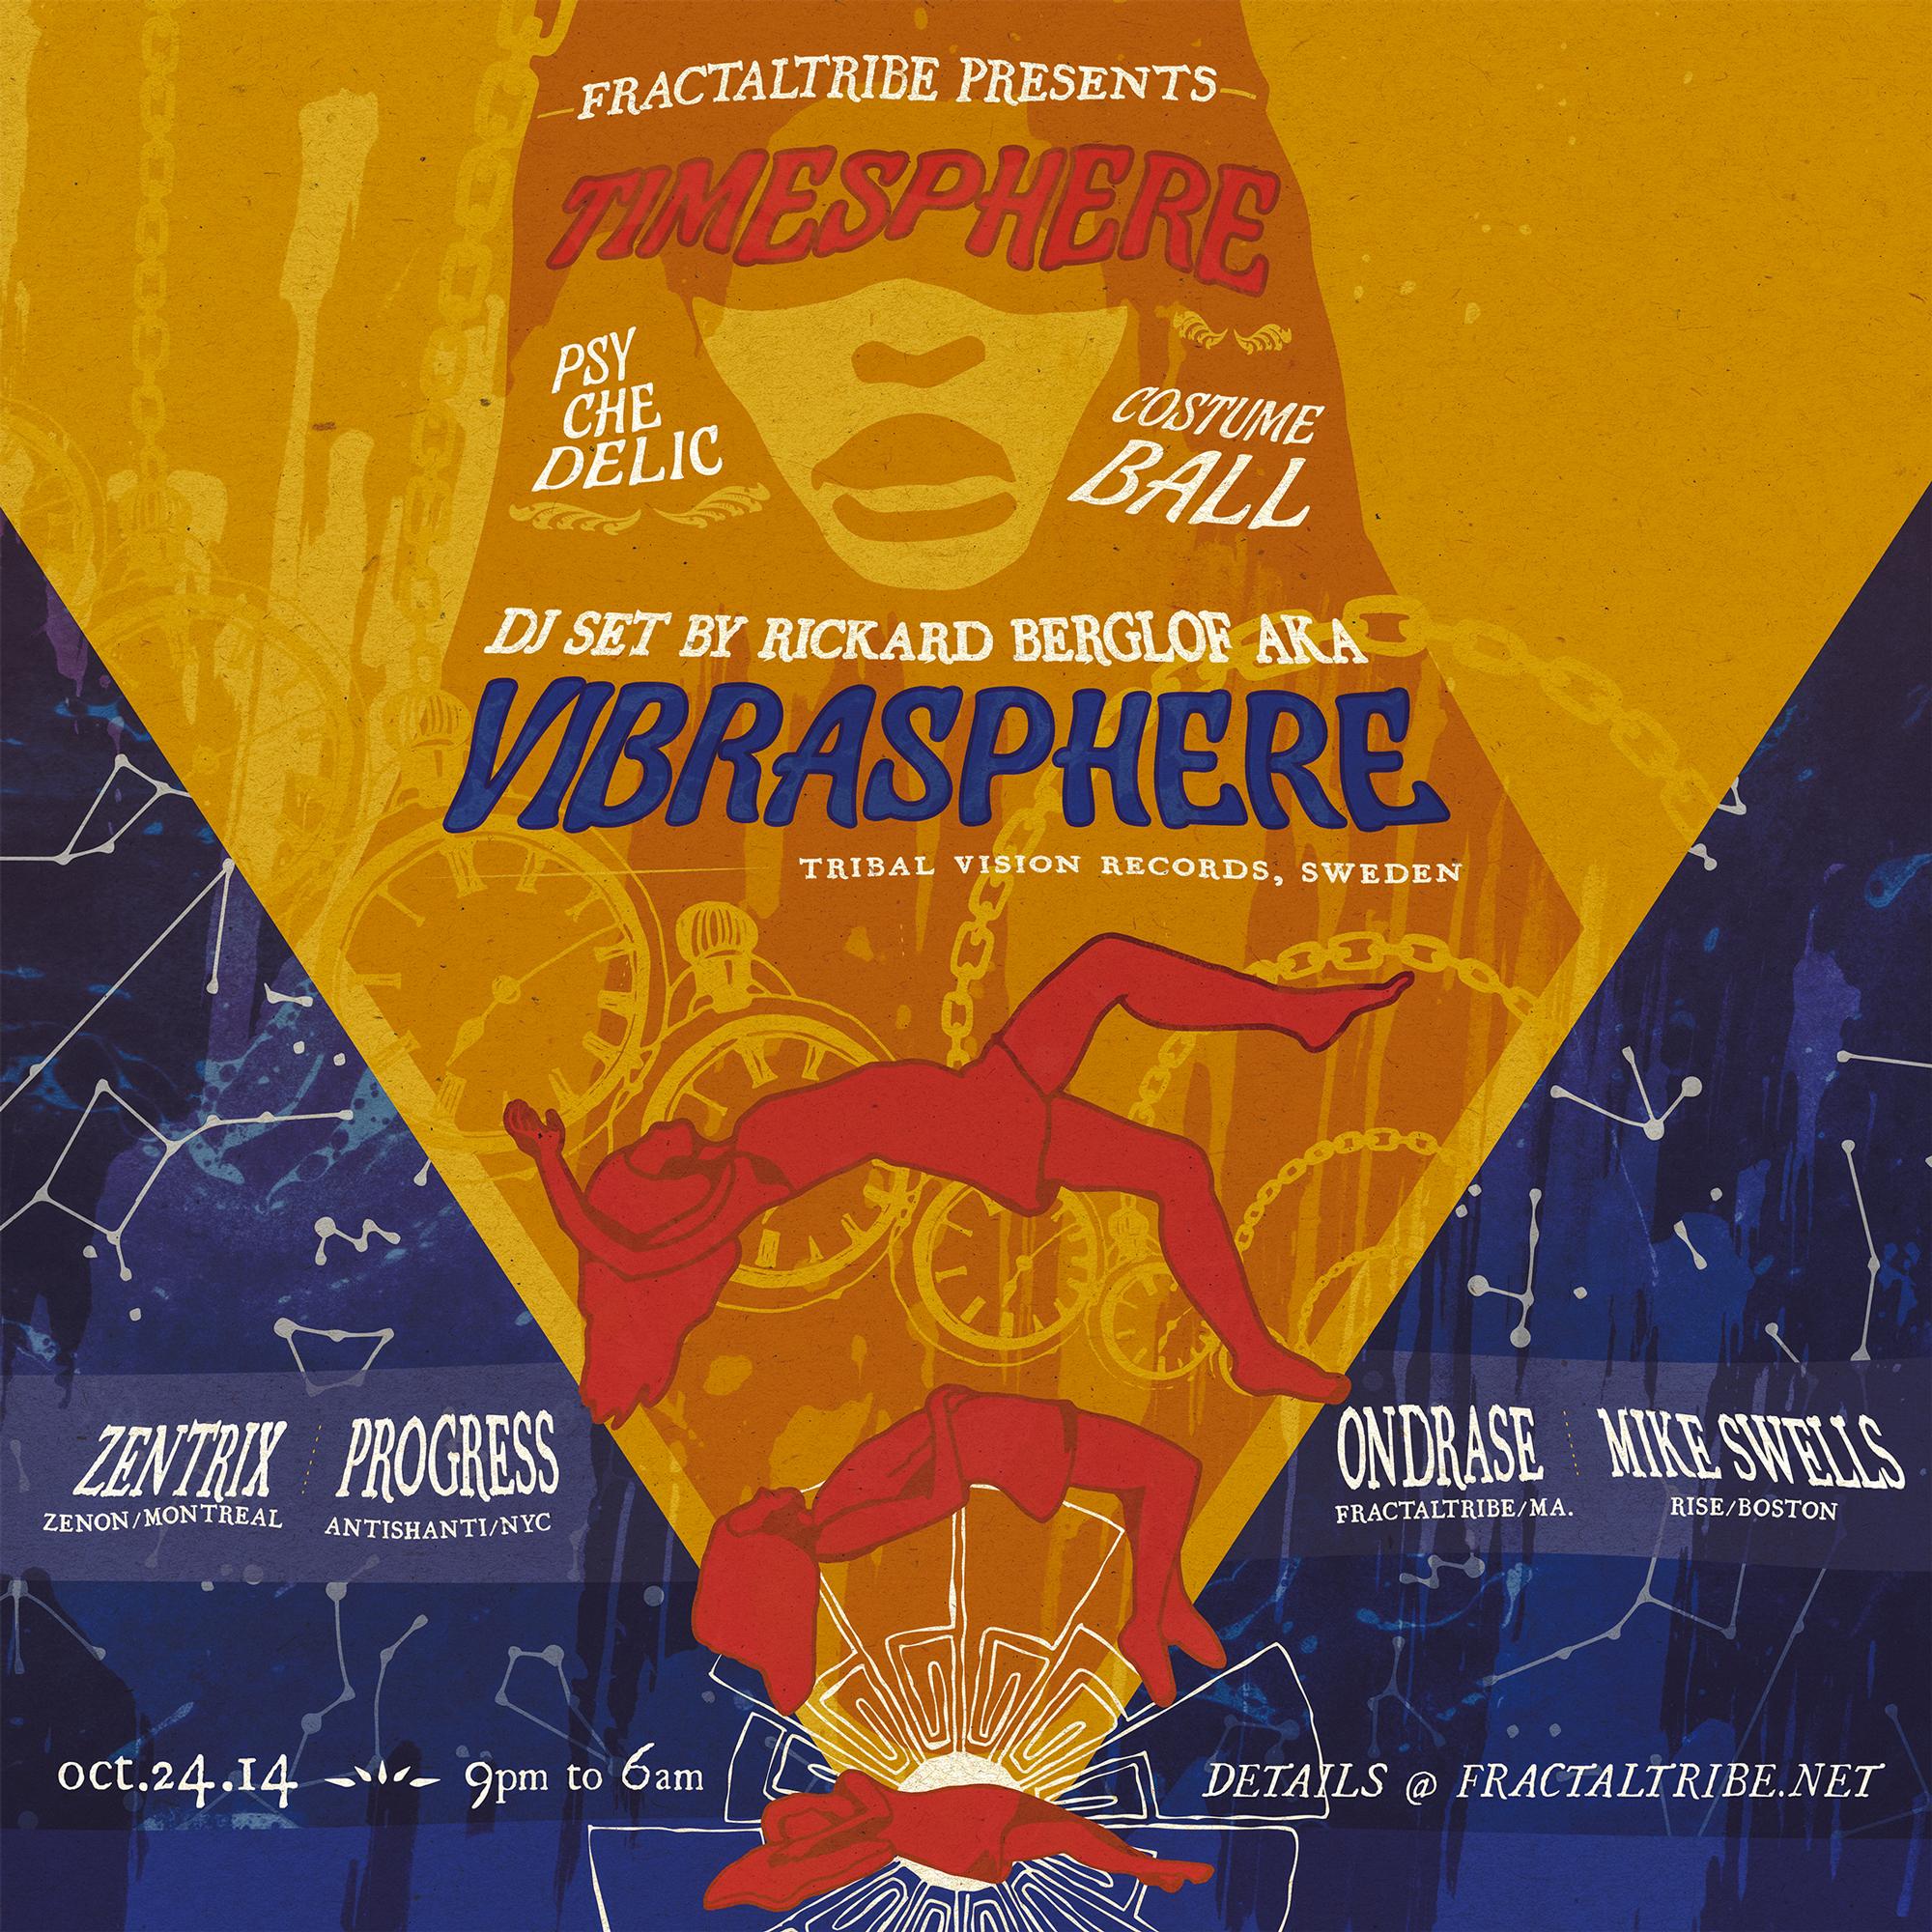 Timesphere flyer.jpg